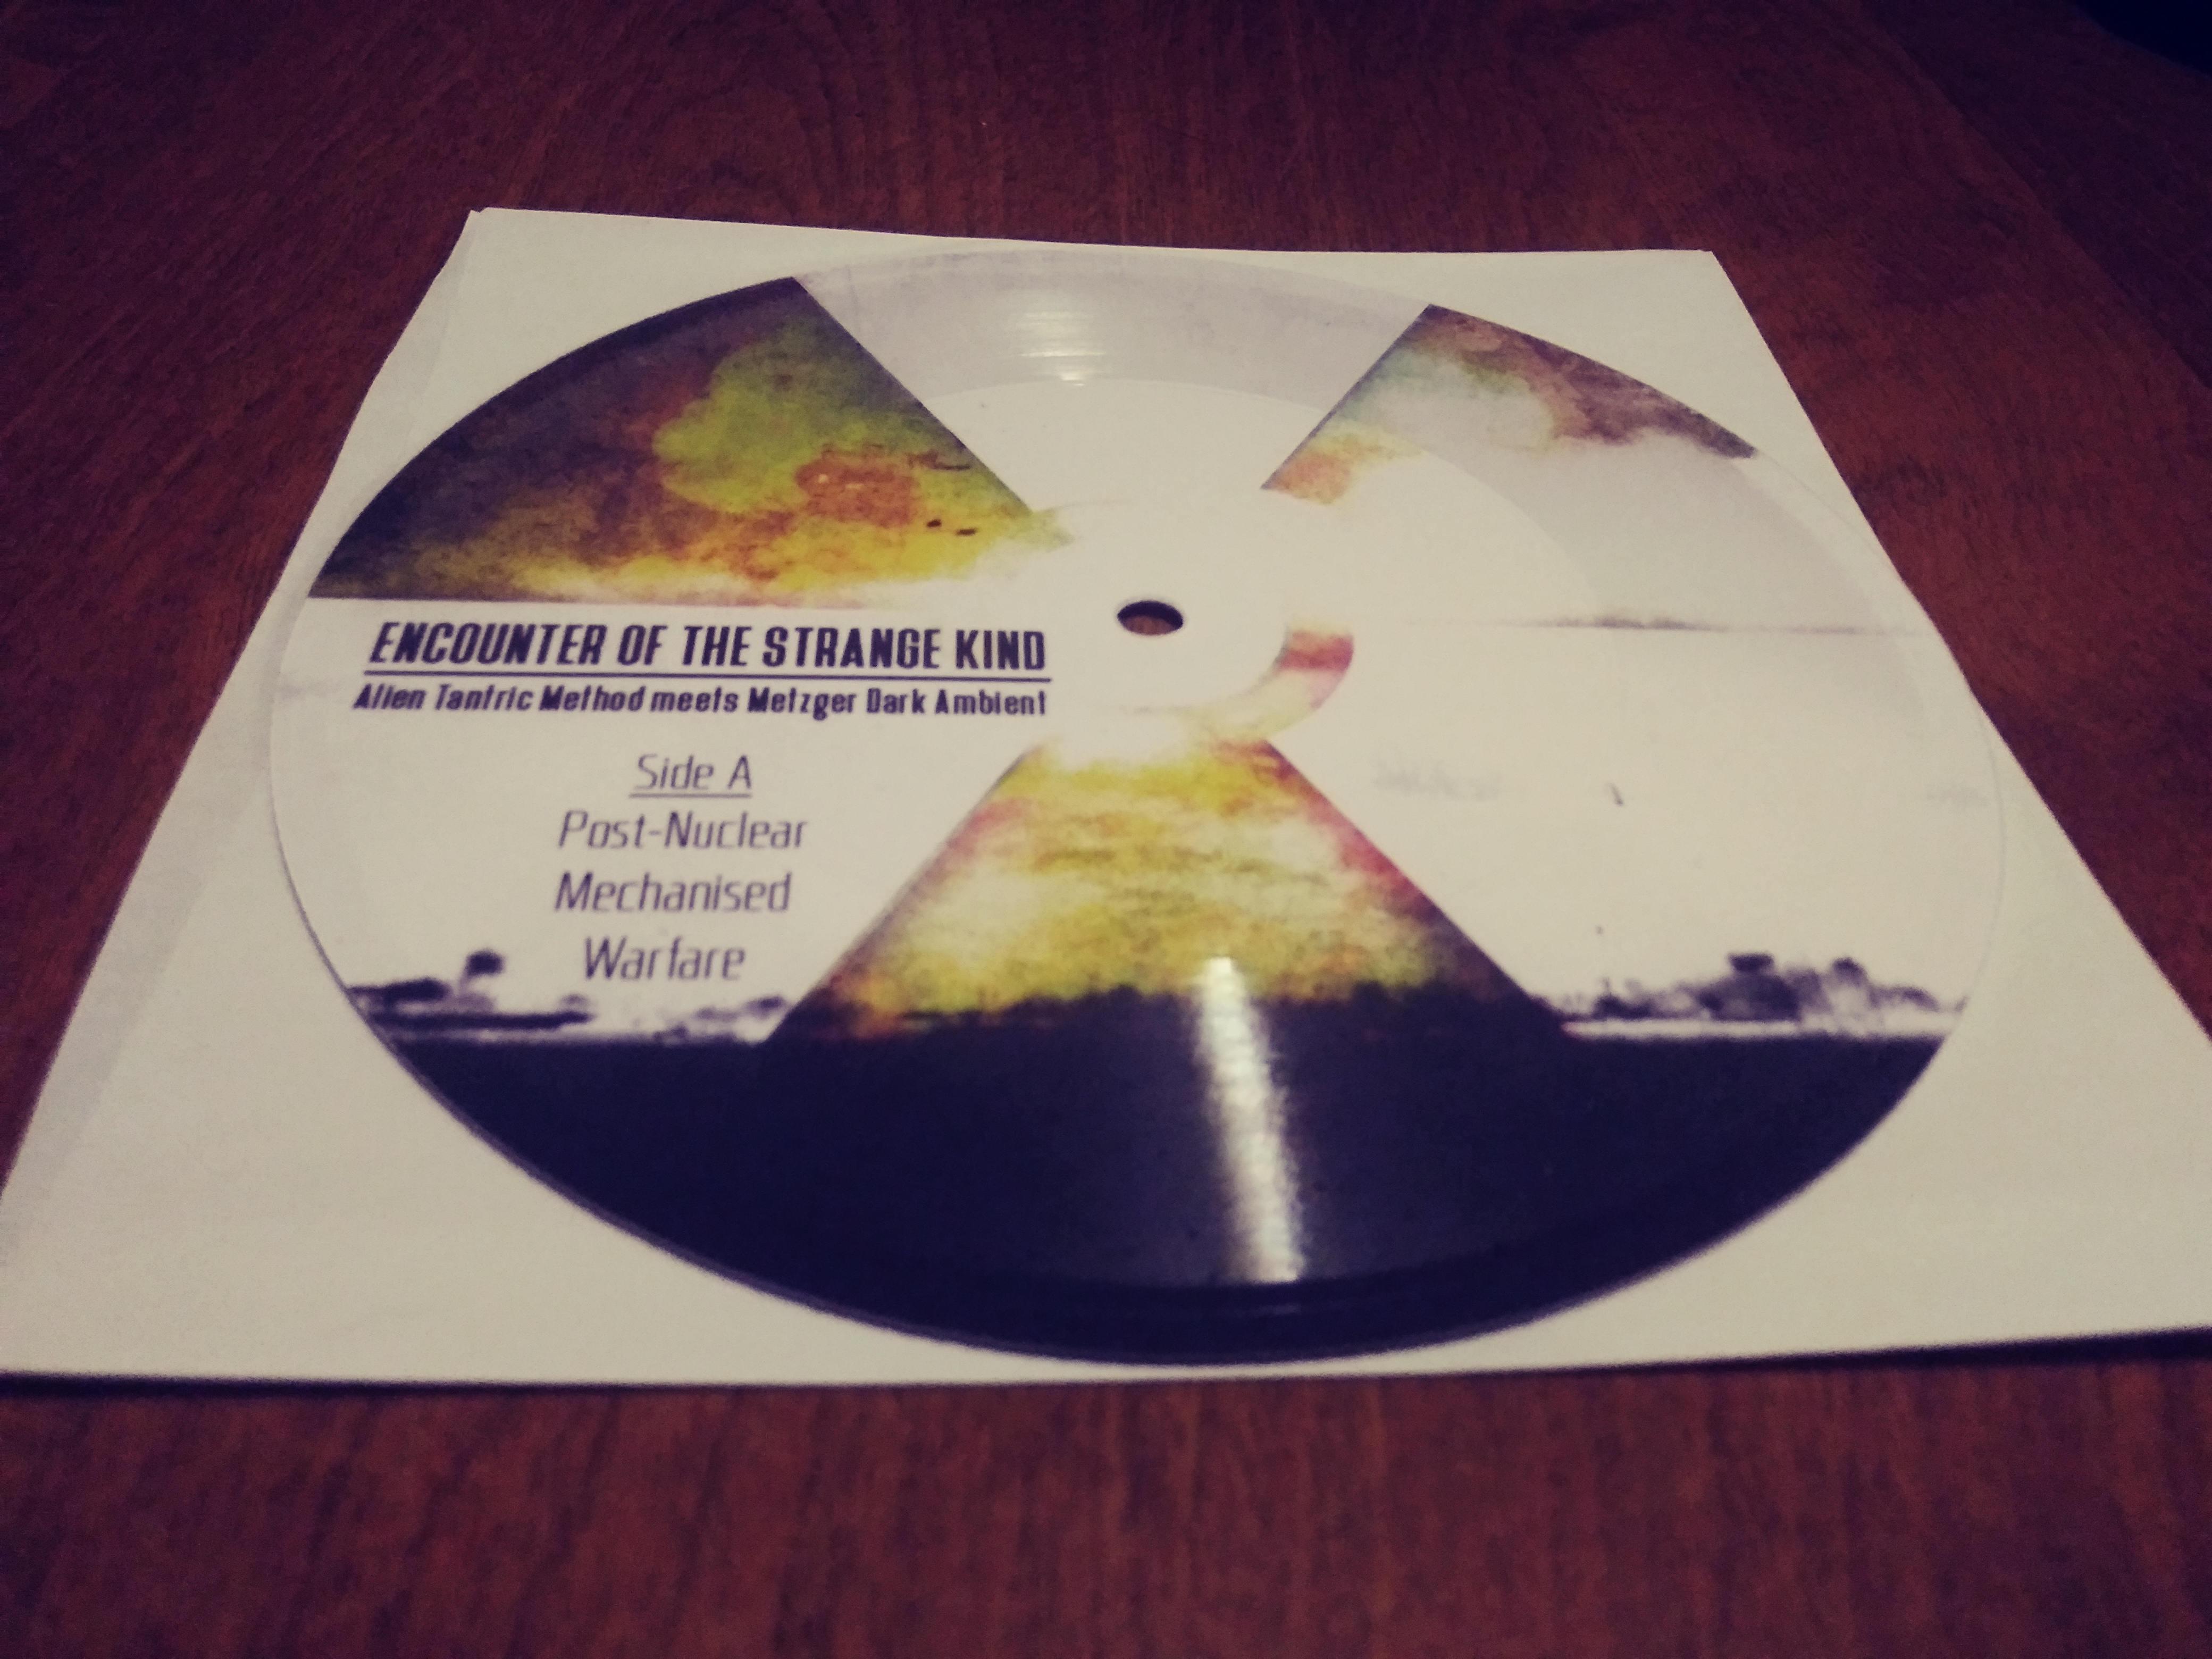 Lathe Cut Vinyl Record 7 inch Metzger & Alien Tantric Method from Metzger  Dark Ambient